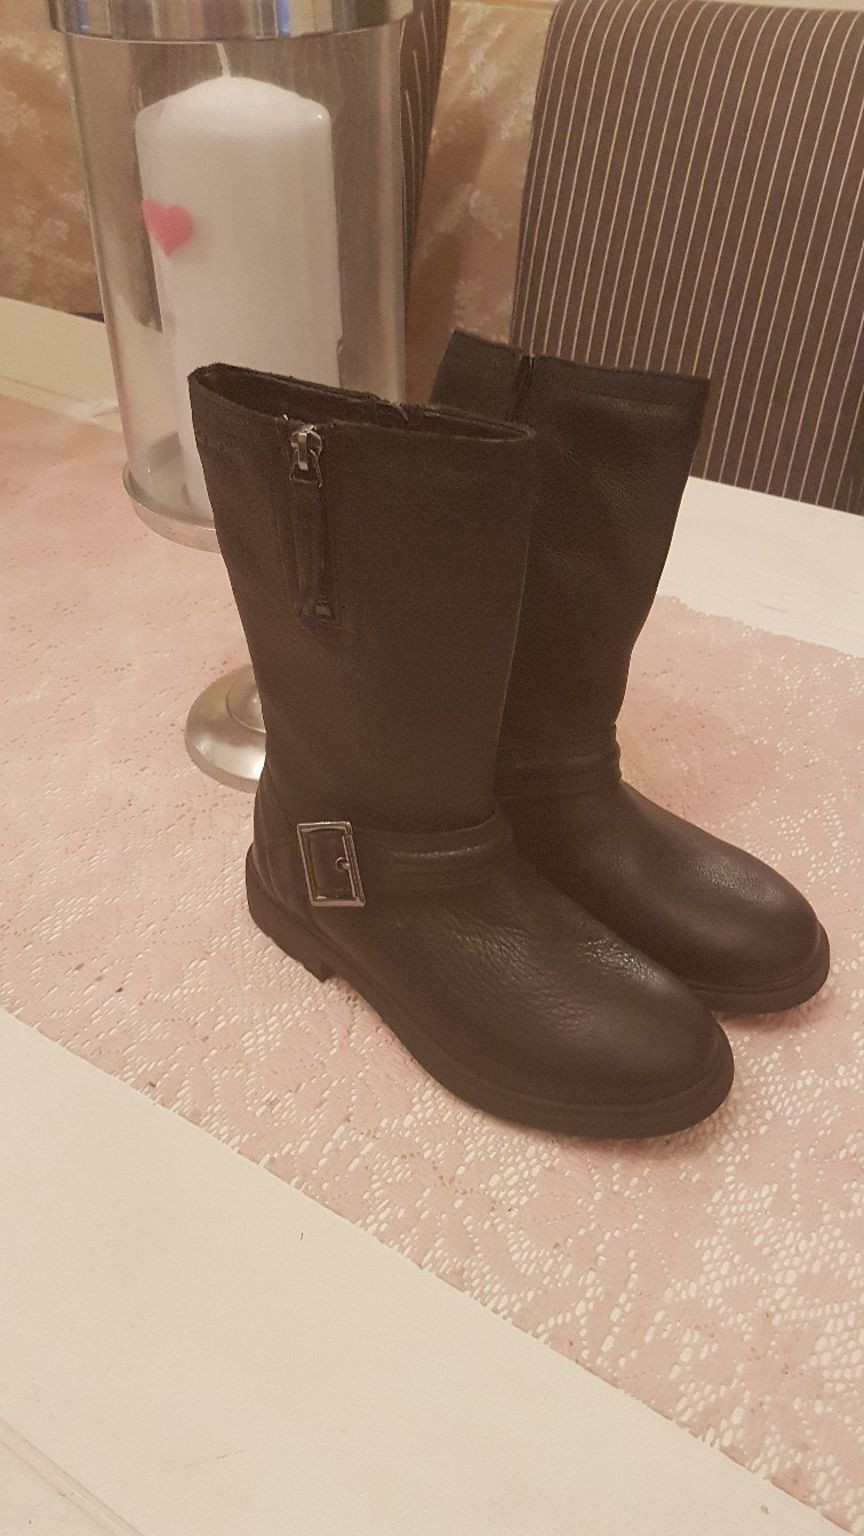 resin cowboy boot vase of https en shpock com i wtxtrvqo5b2dance 2017 10 26t170603 pertaining to brand new clarks boots 67186cbb